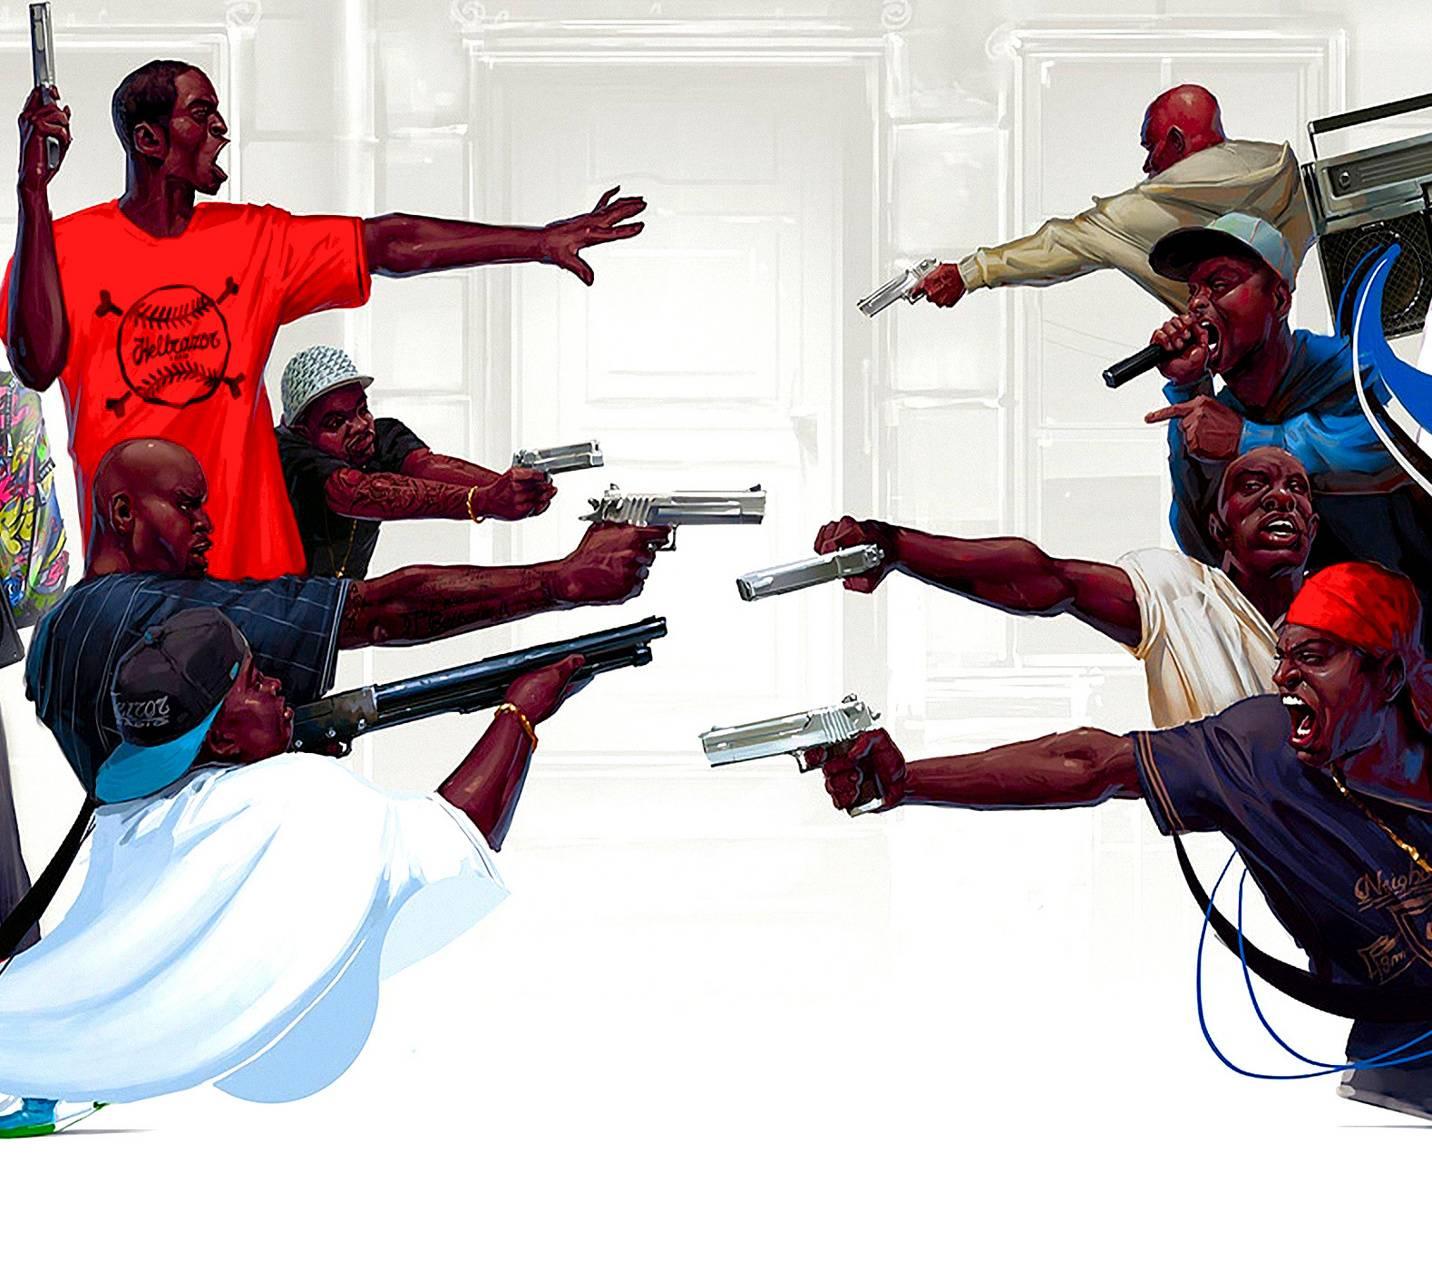 New York Gangs Wallpaper By Loveless1982 A0 Free On Zedge